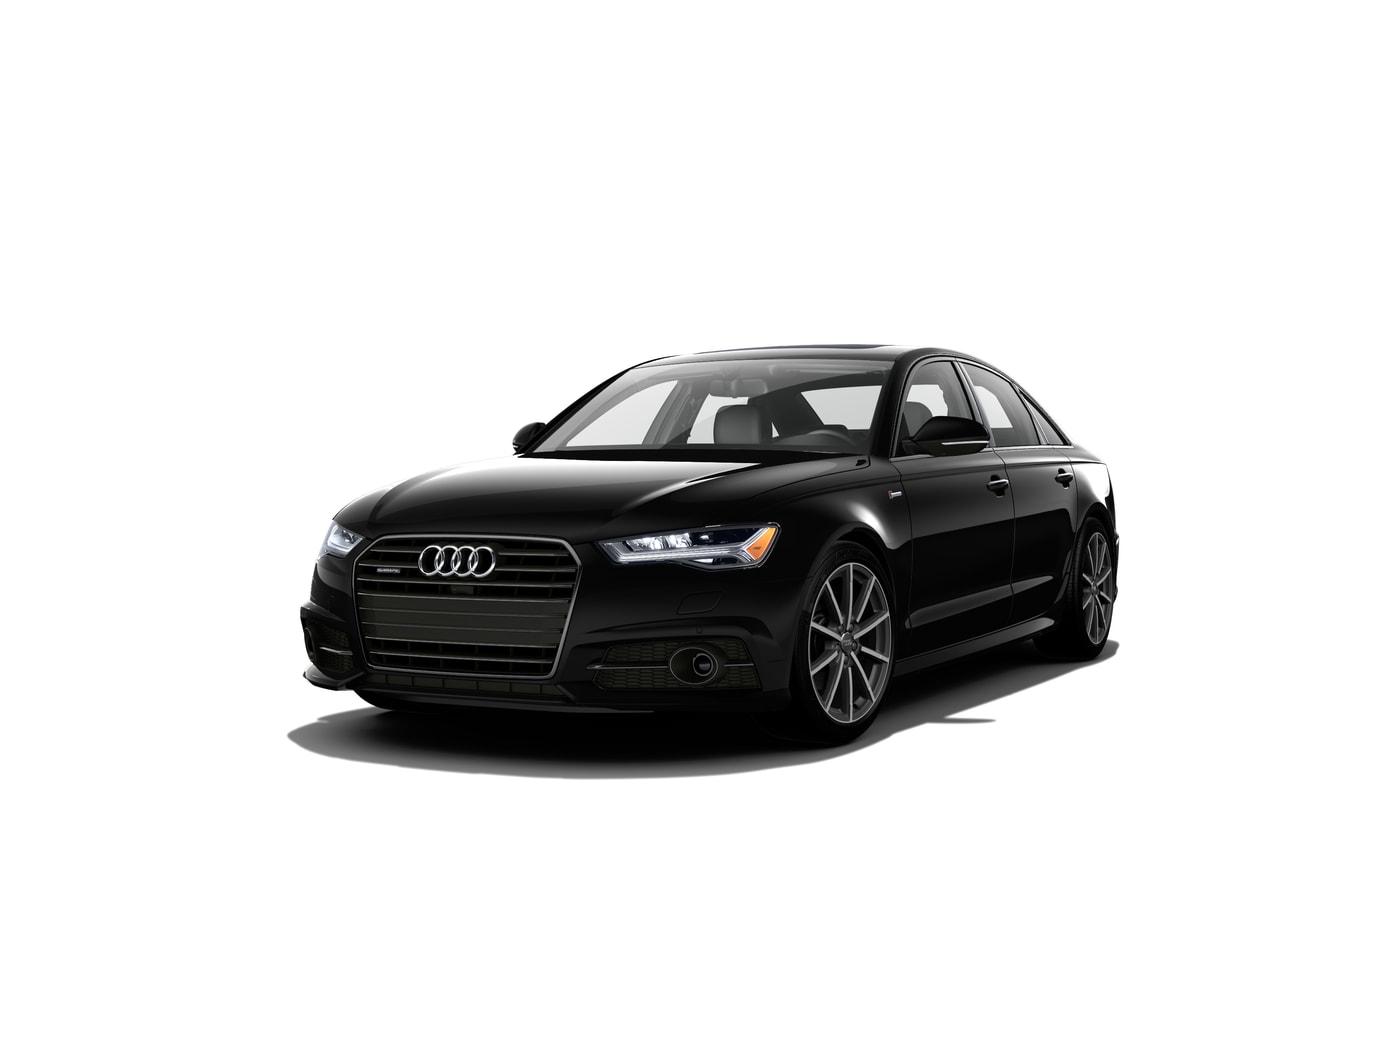 Napleton's Audi | Vehicles for sale in s Park, IL 61111